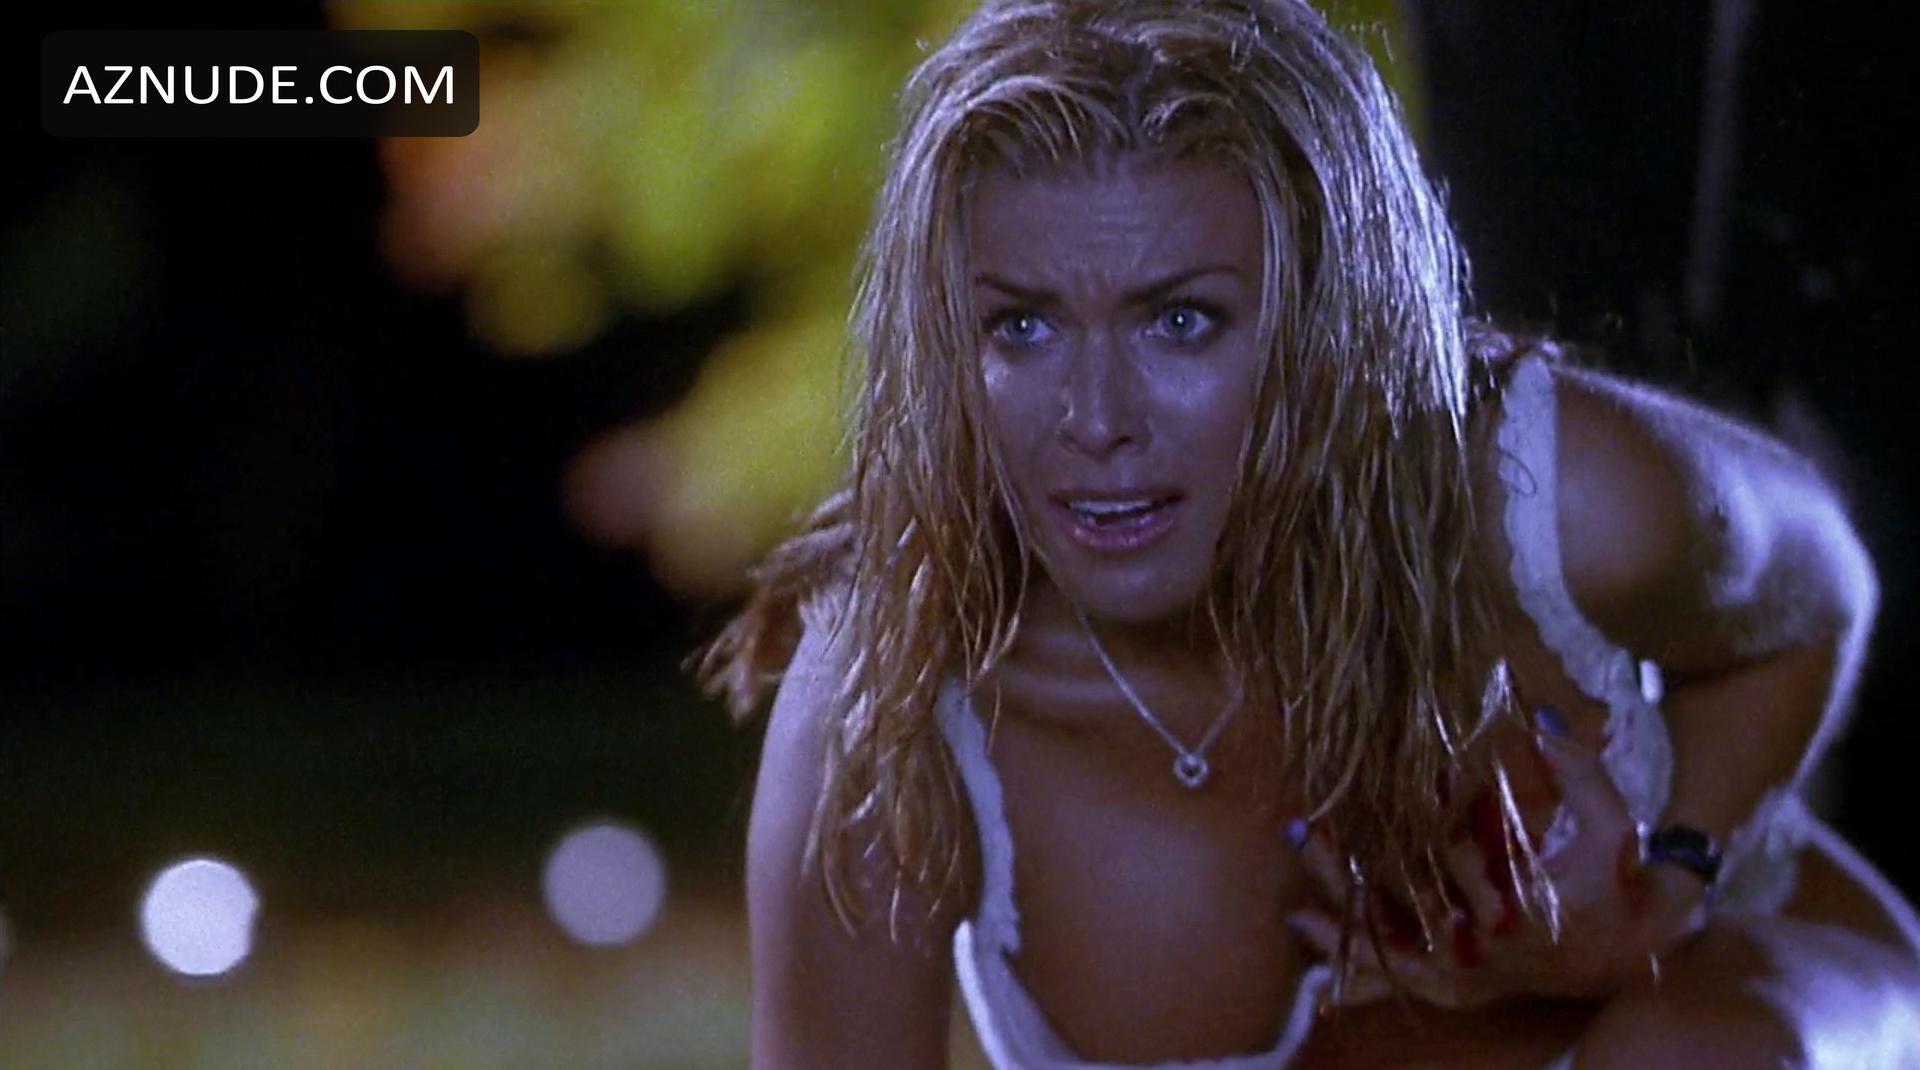 Scary Movie Nude Scenes - Aznude-4244